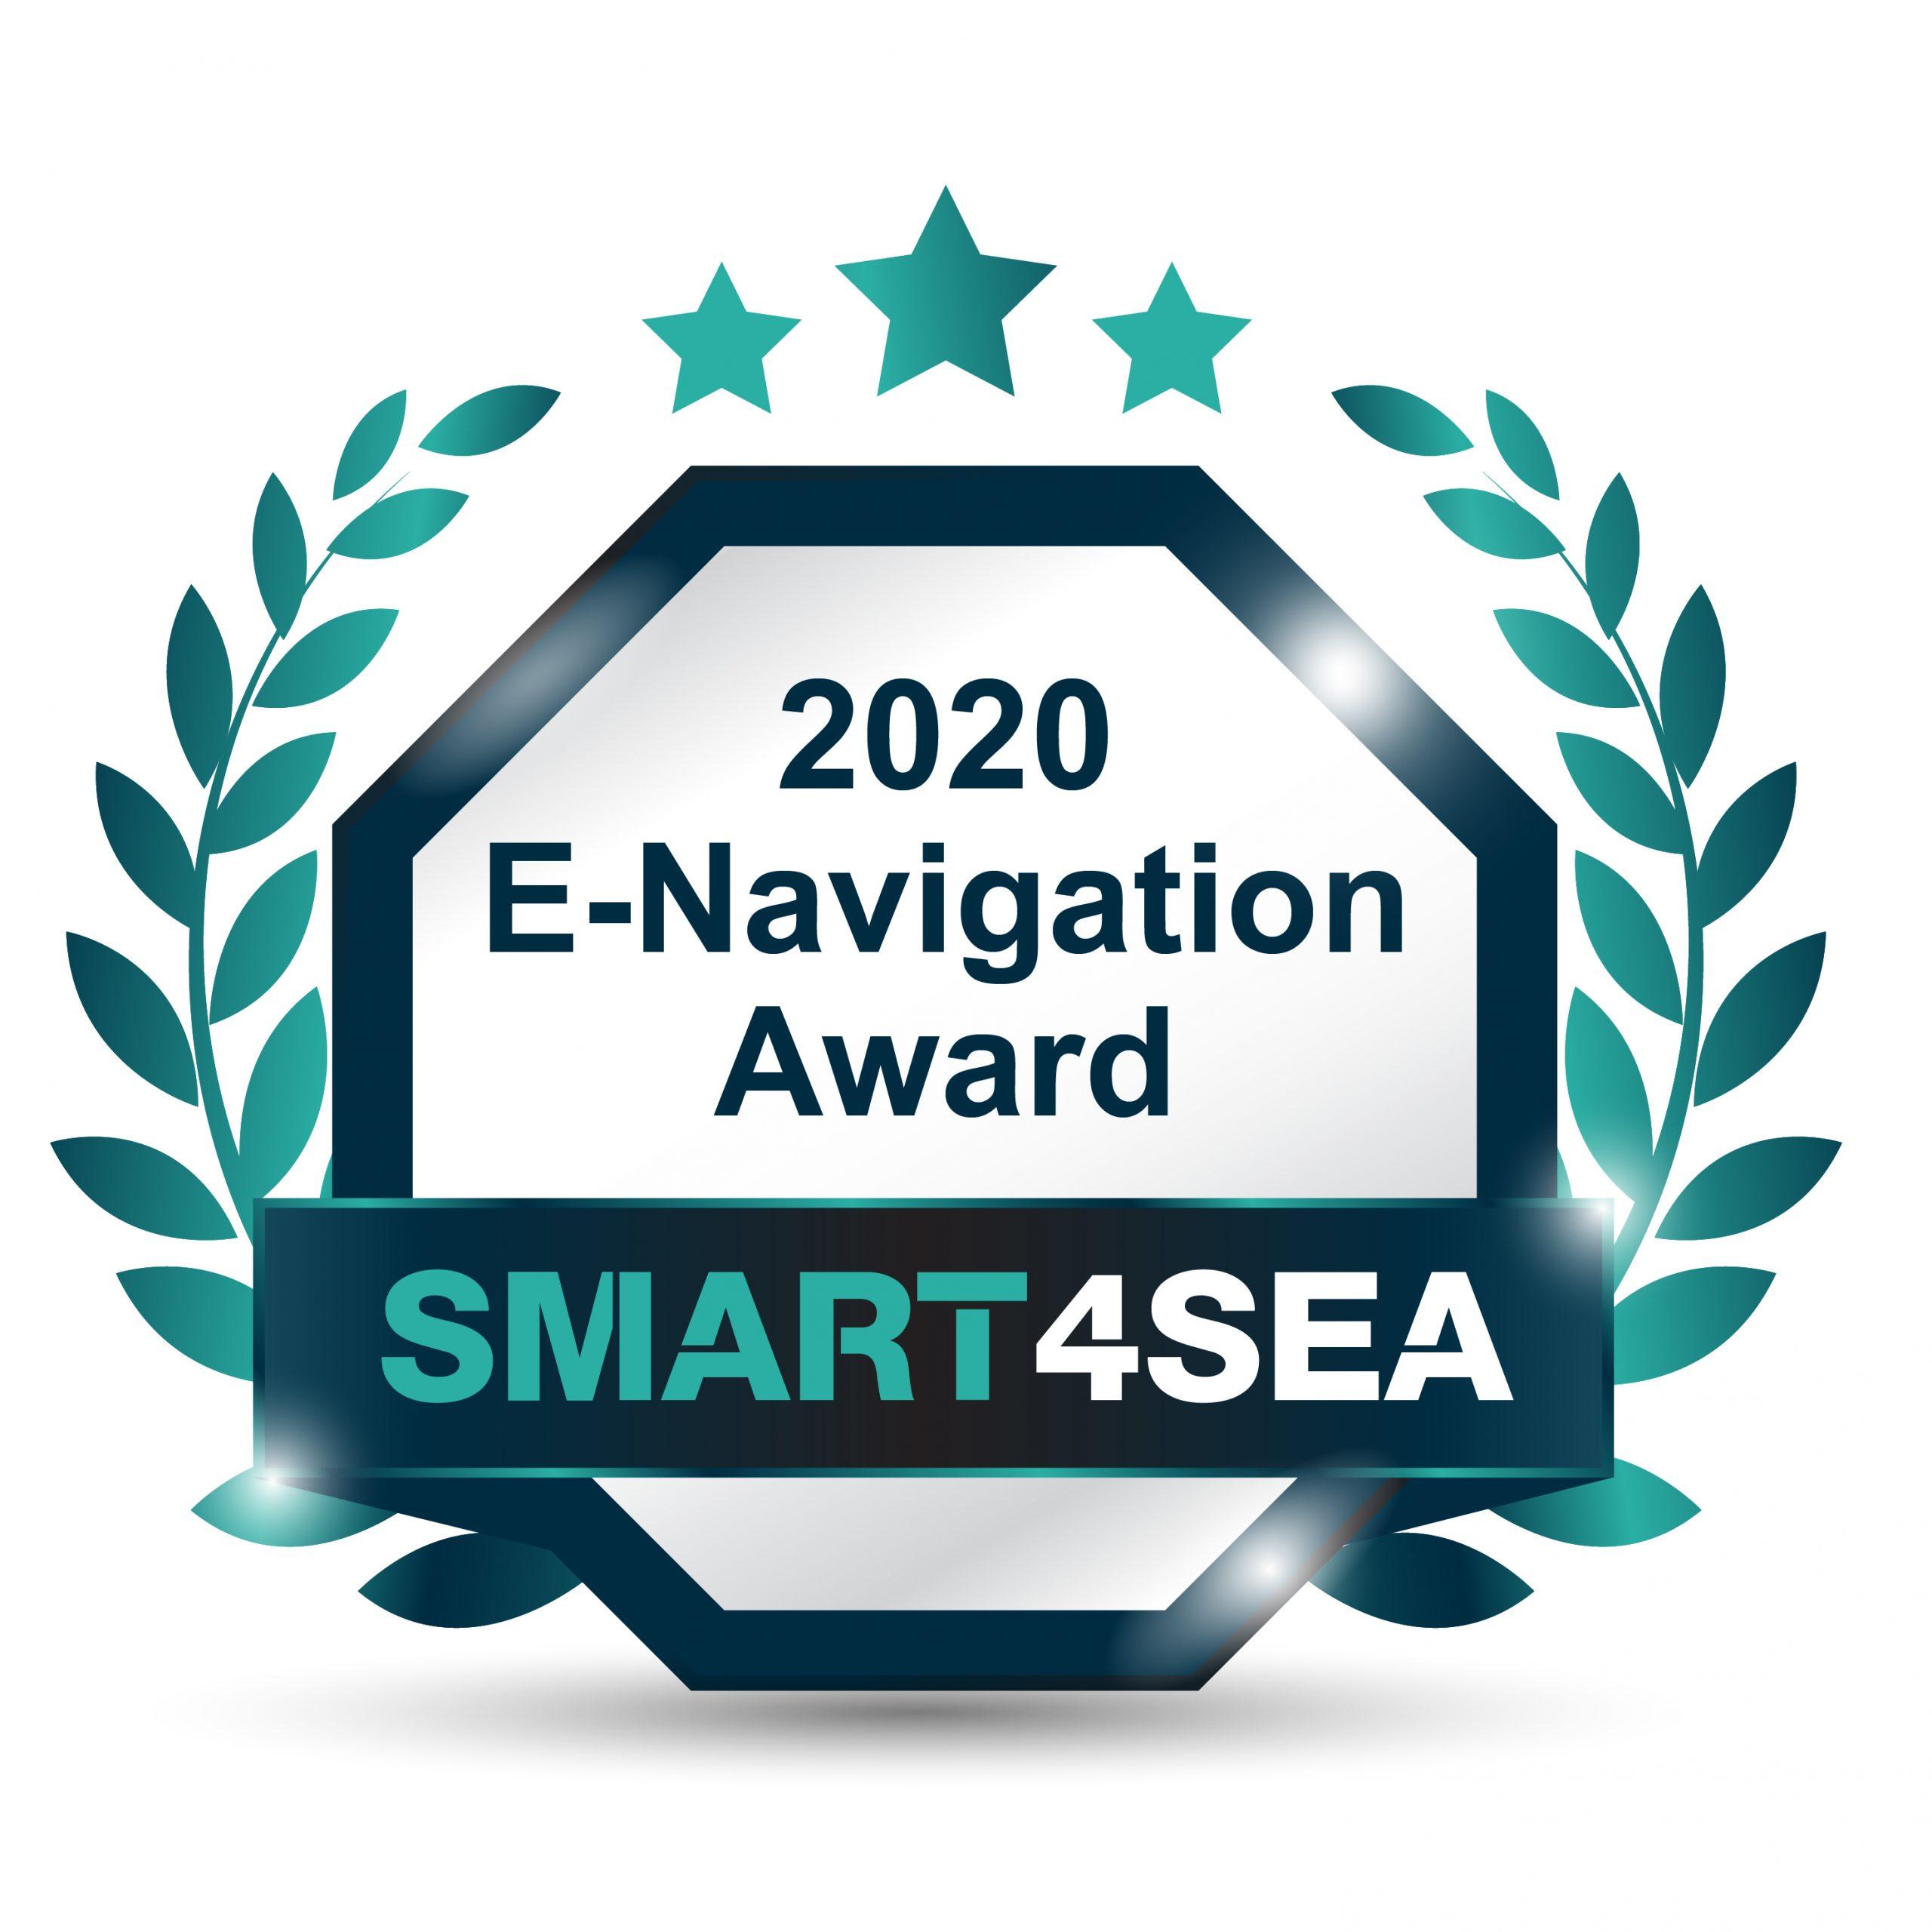 MarineFields Holding wins the SMART4SEA E-Navigation Award